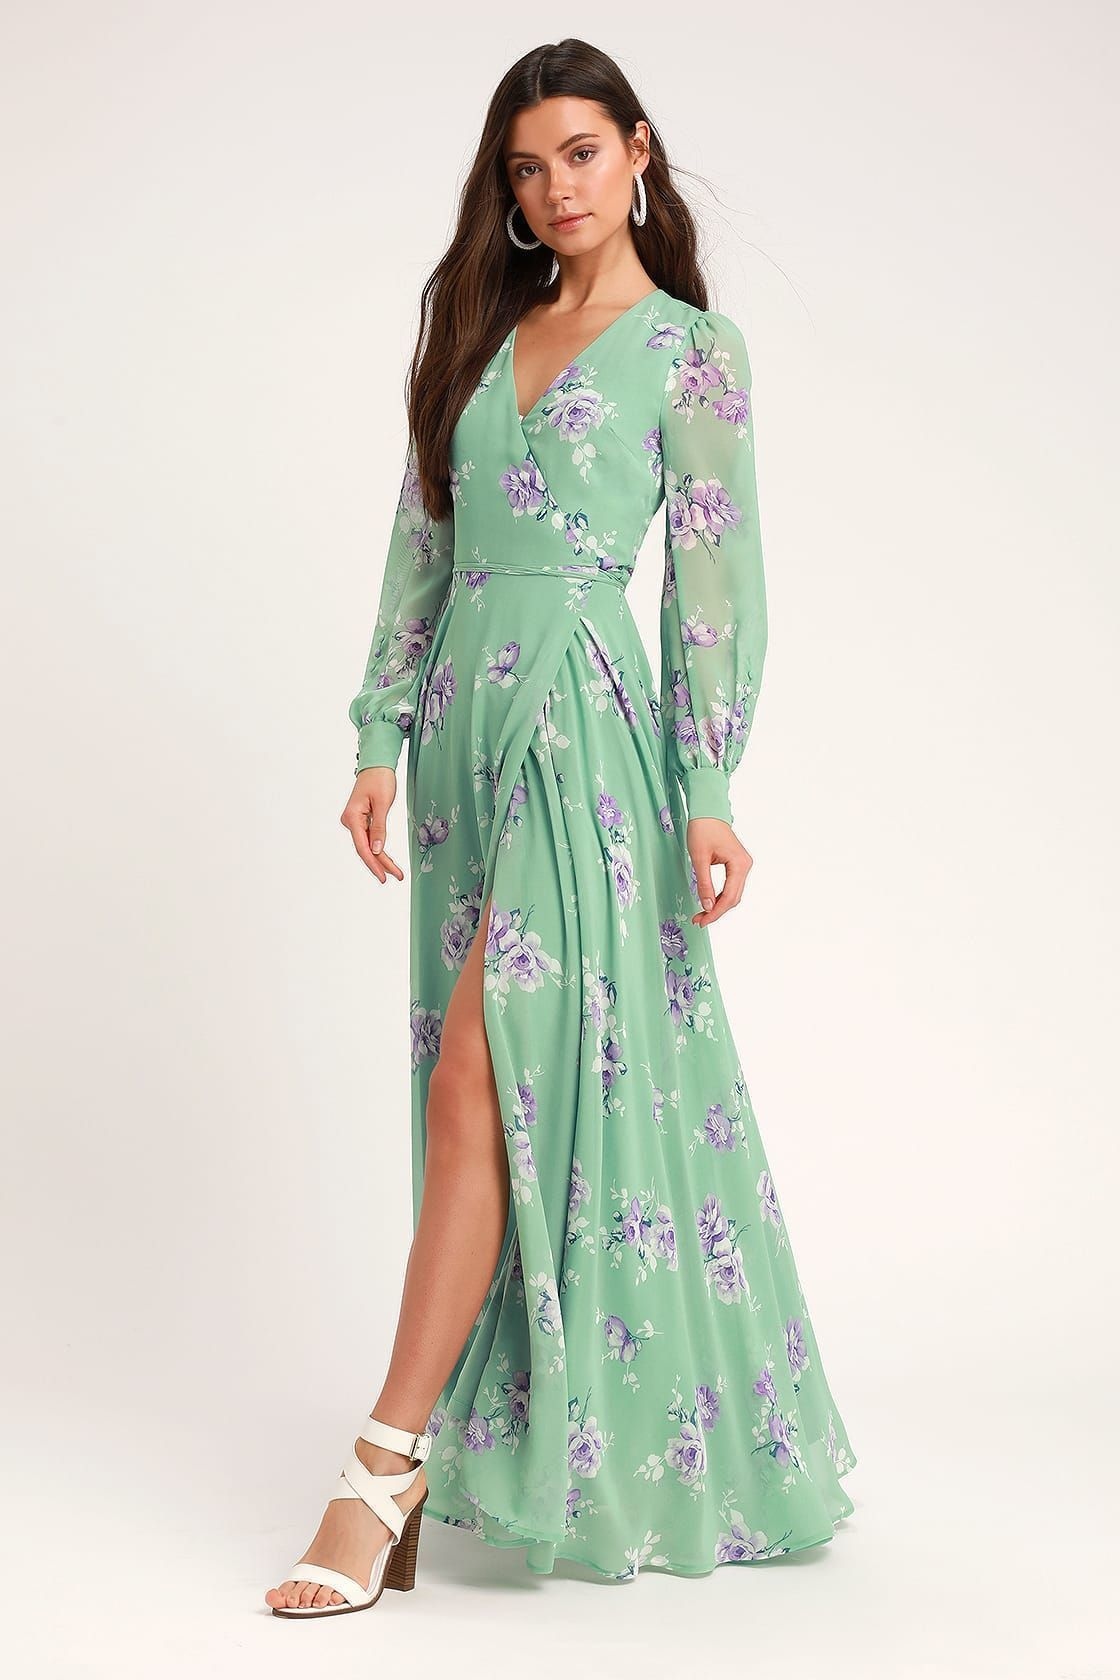 Sage Green Floral Printed Wrap Dress